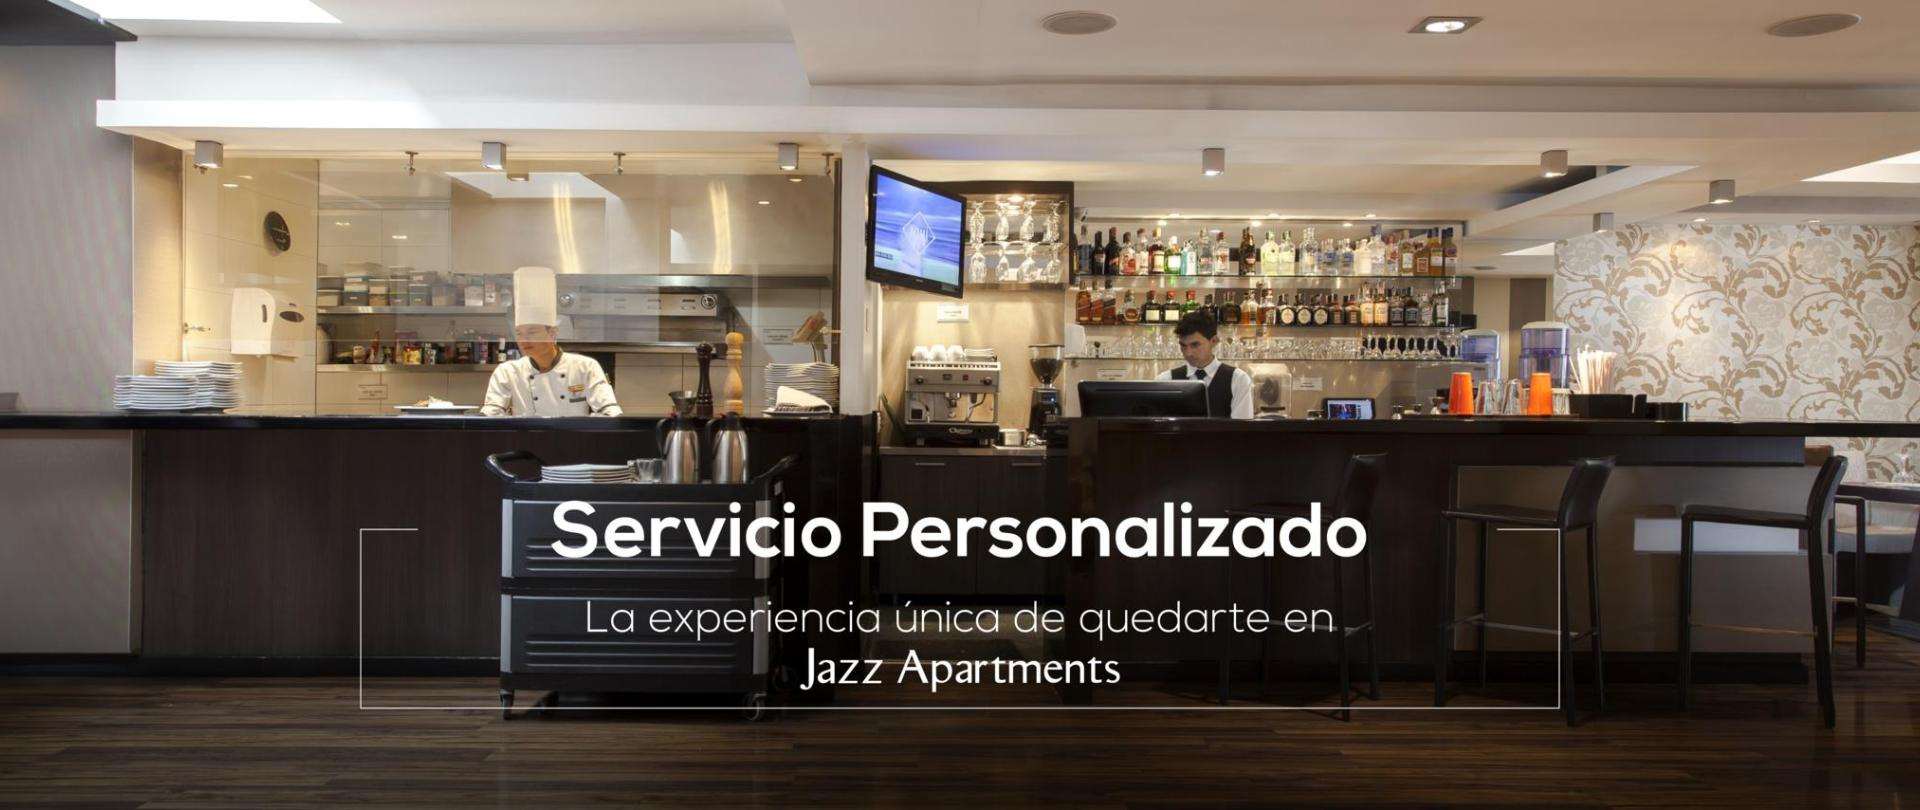 WWW-jazzapartments-COM-服務定制ESPA-ol.png